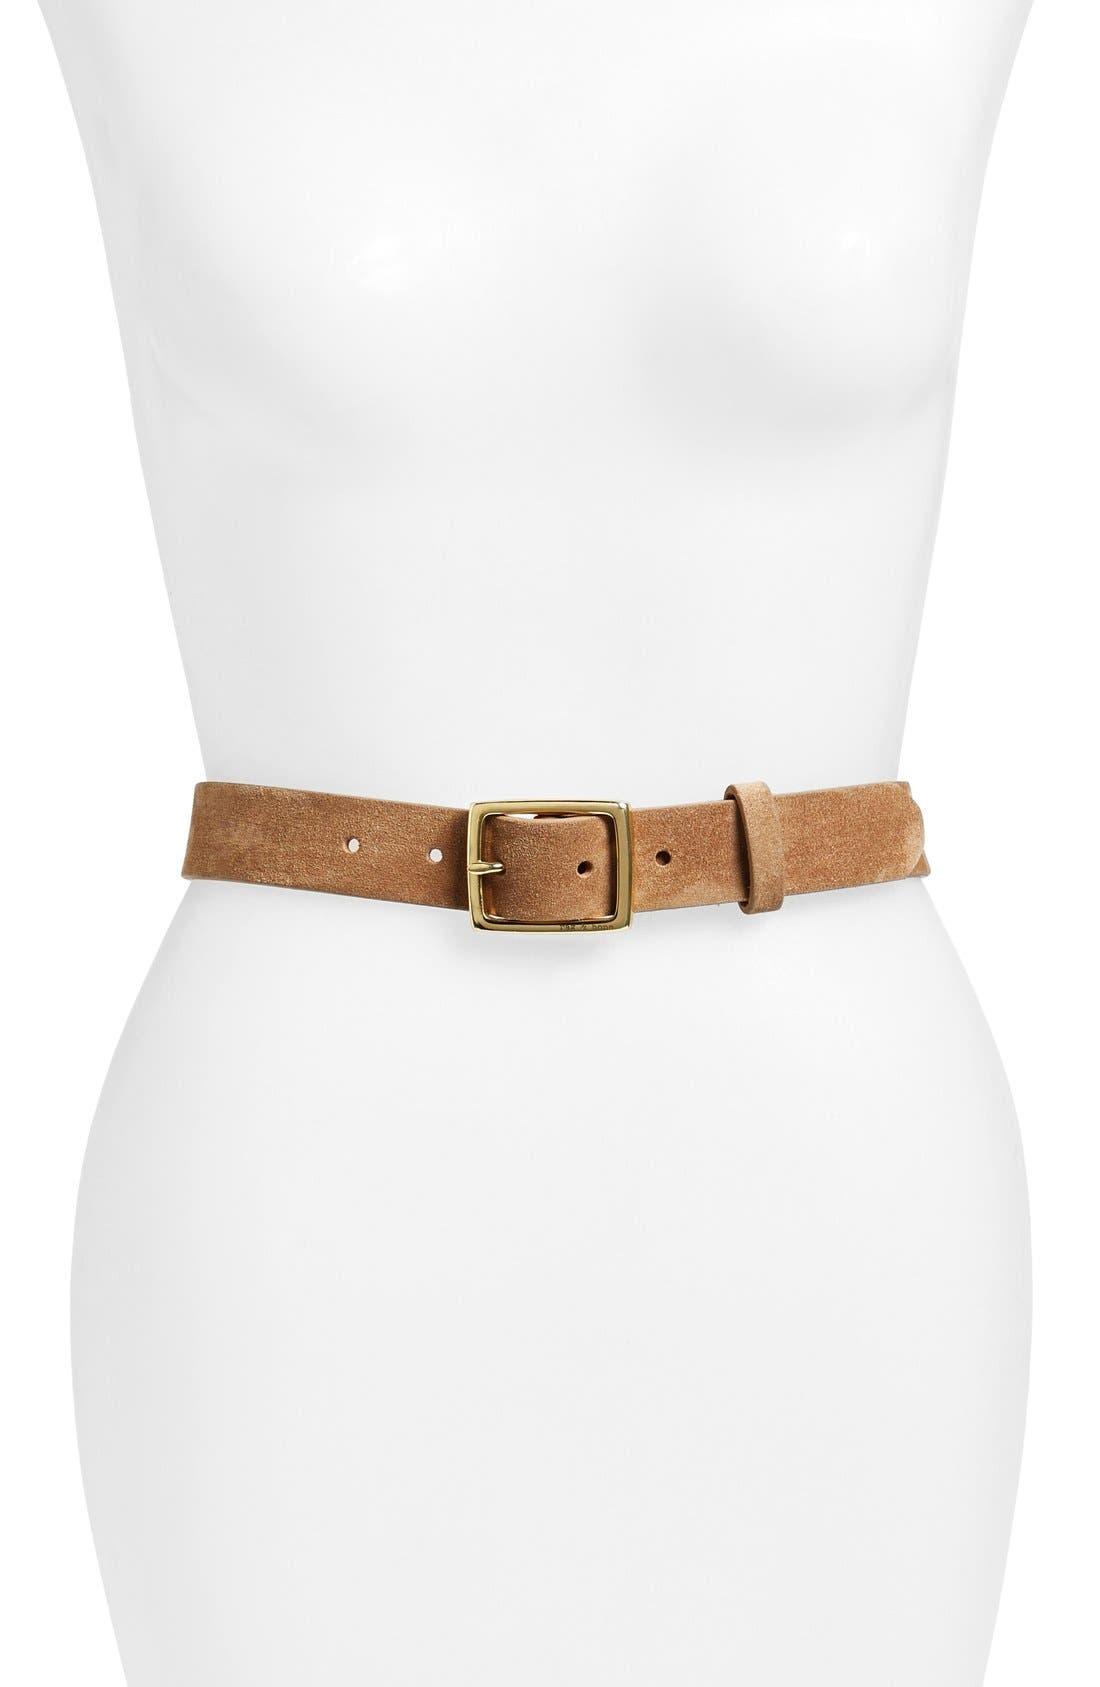 Main Image - rag & bone 'Boyfriend' Leather Belt